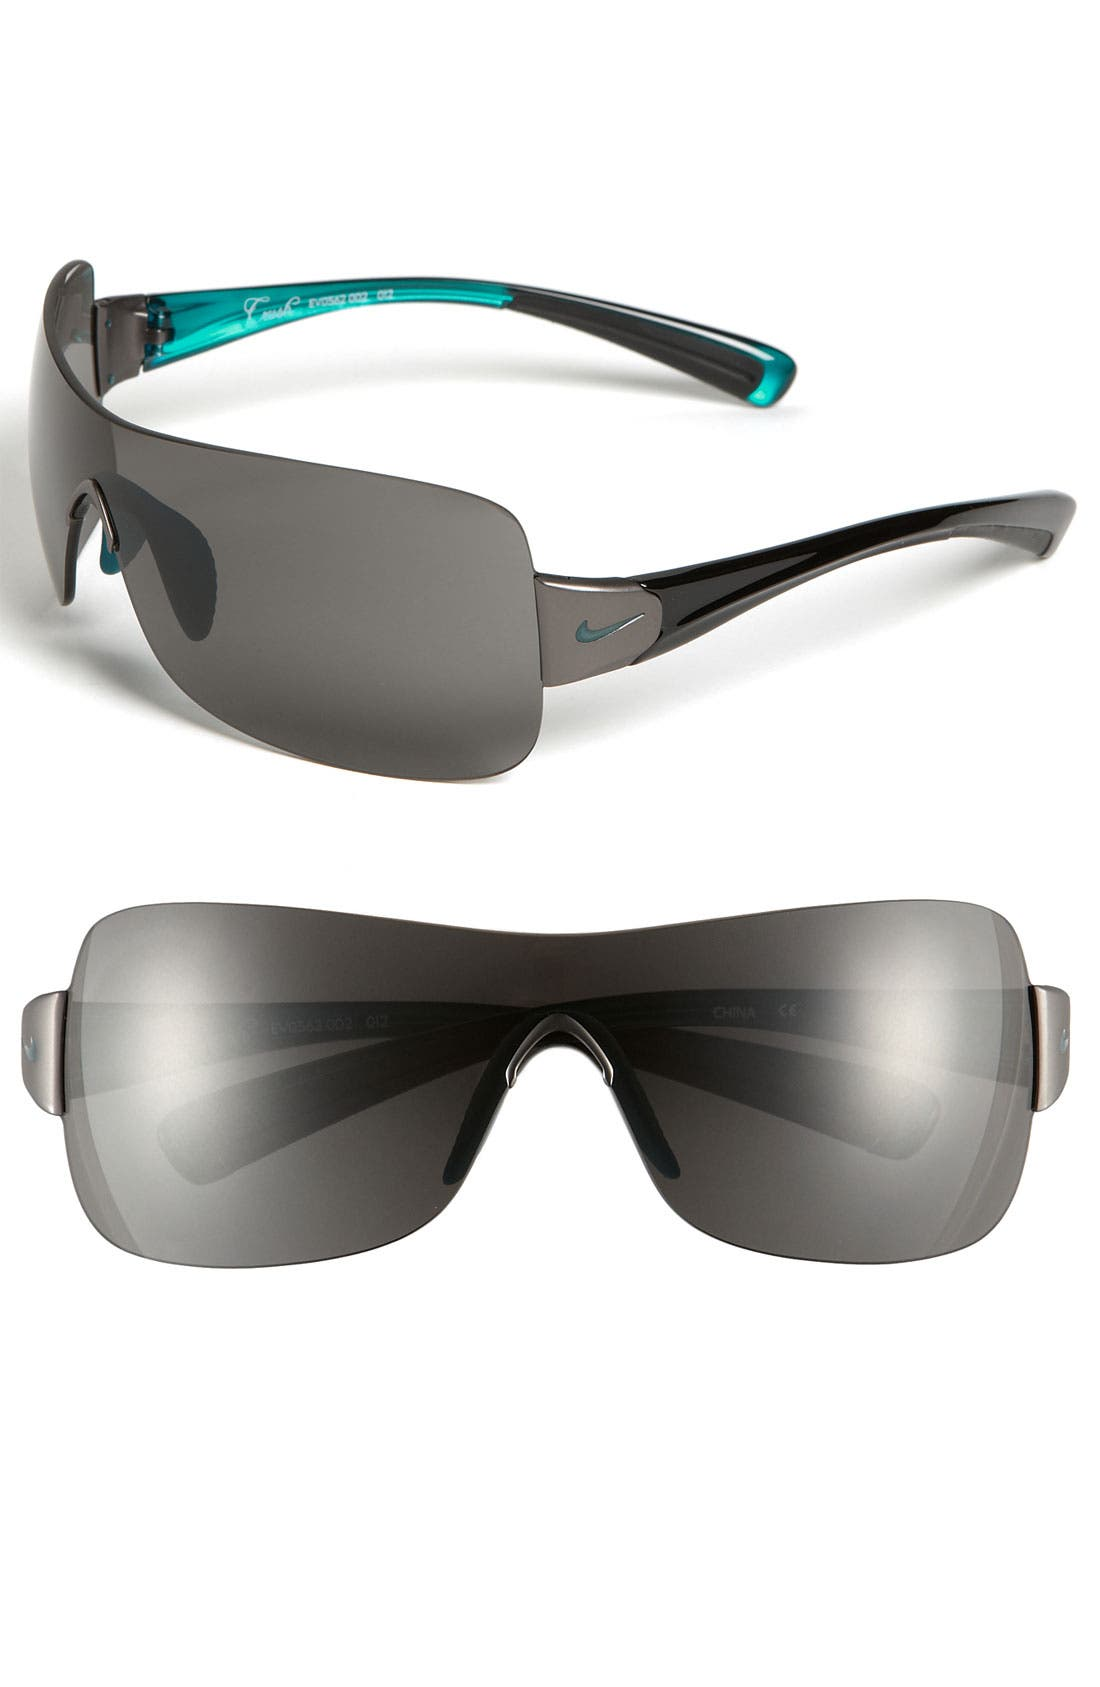 Main Image - Nike 'Crush' 61mm Rimless Shield Sunglasses